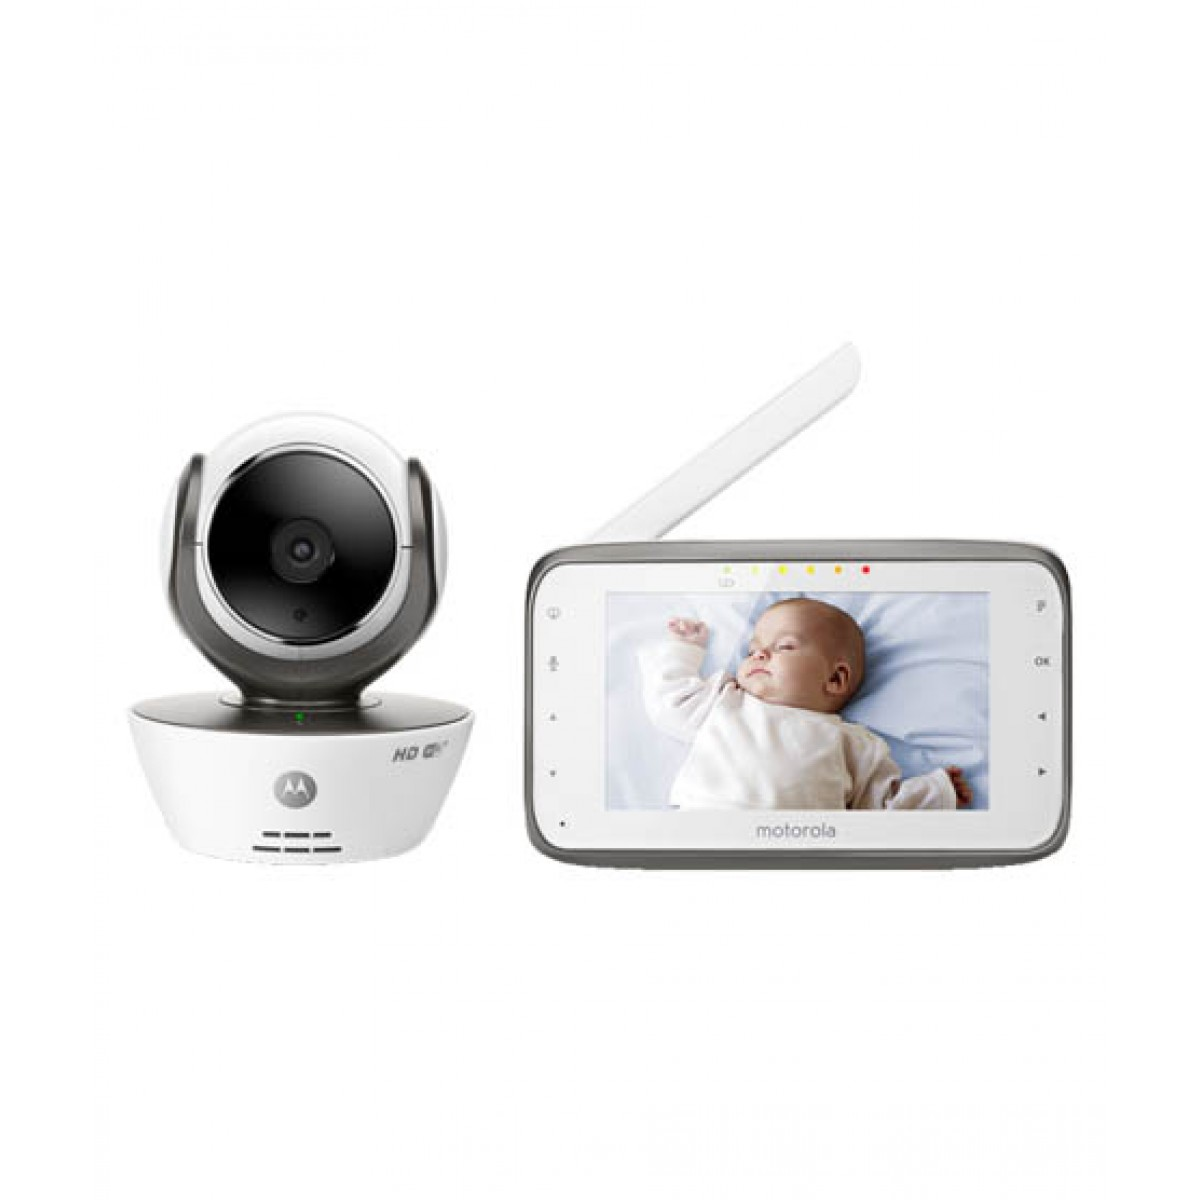 Motorola Baby Monitor & WiFi Camera (MBP854Connect)